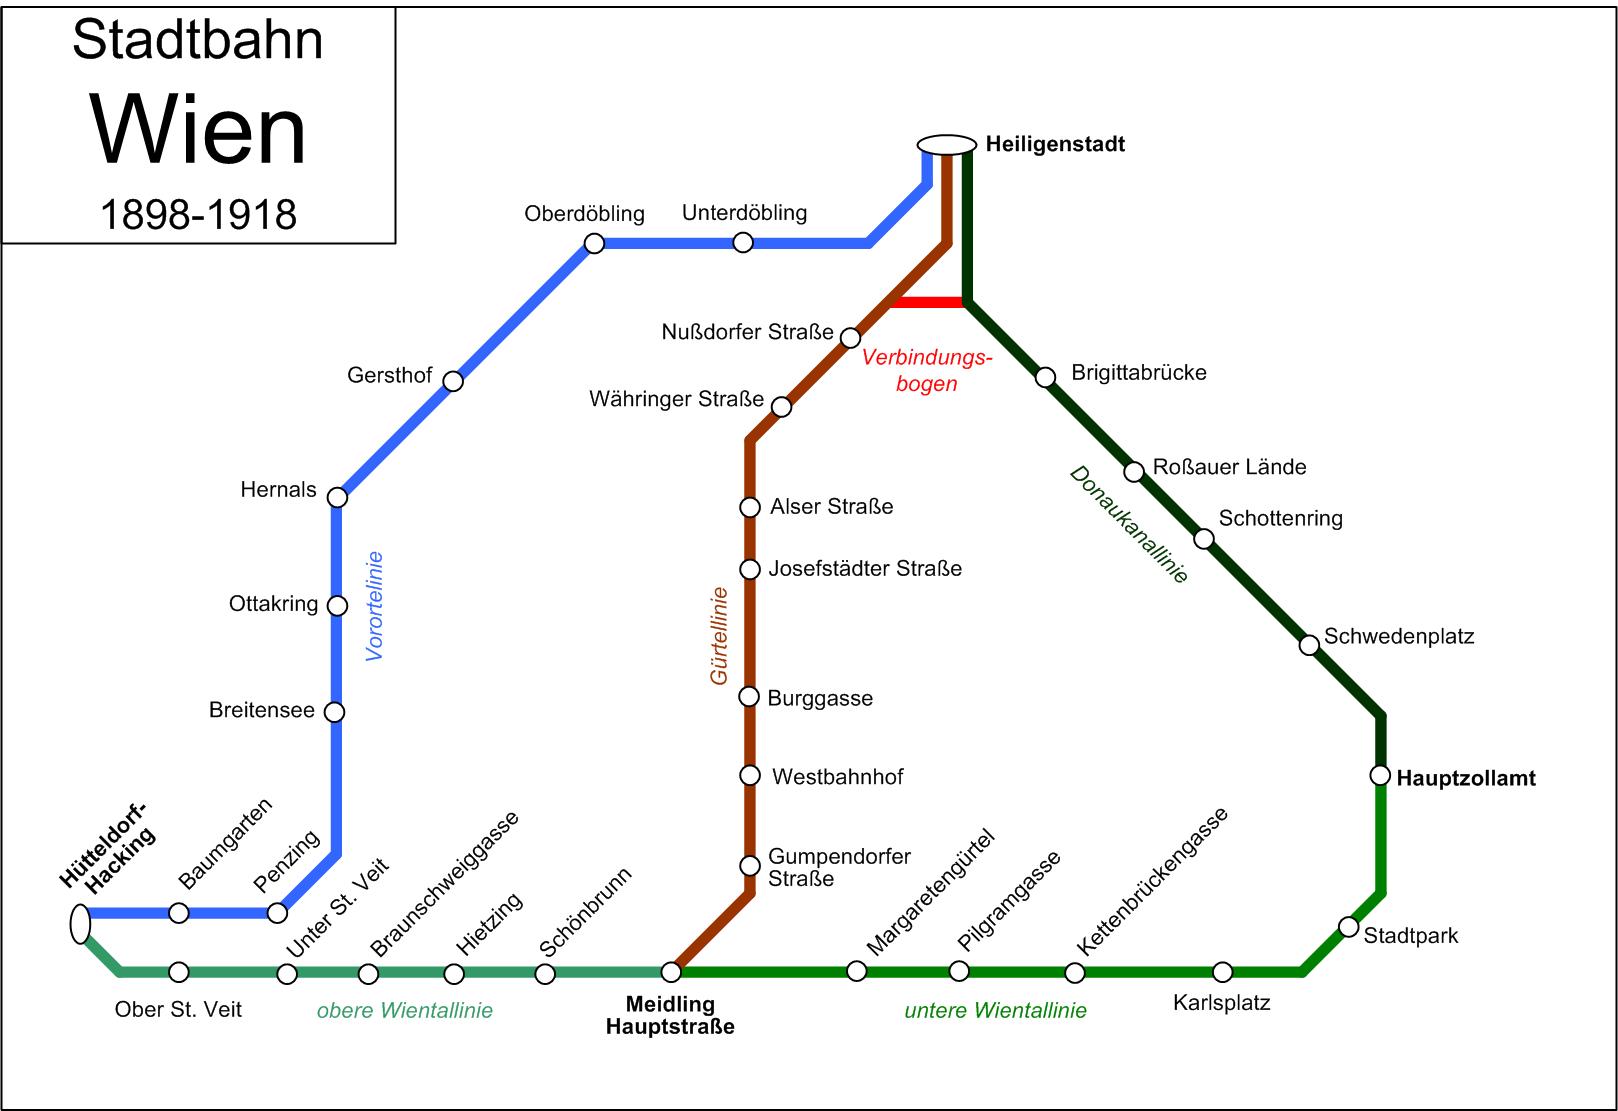 Wiener Stadtbahn.png